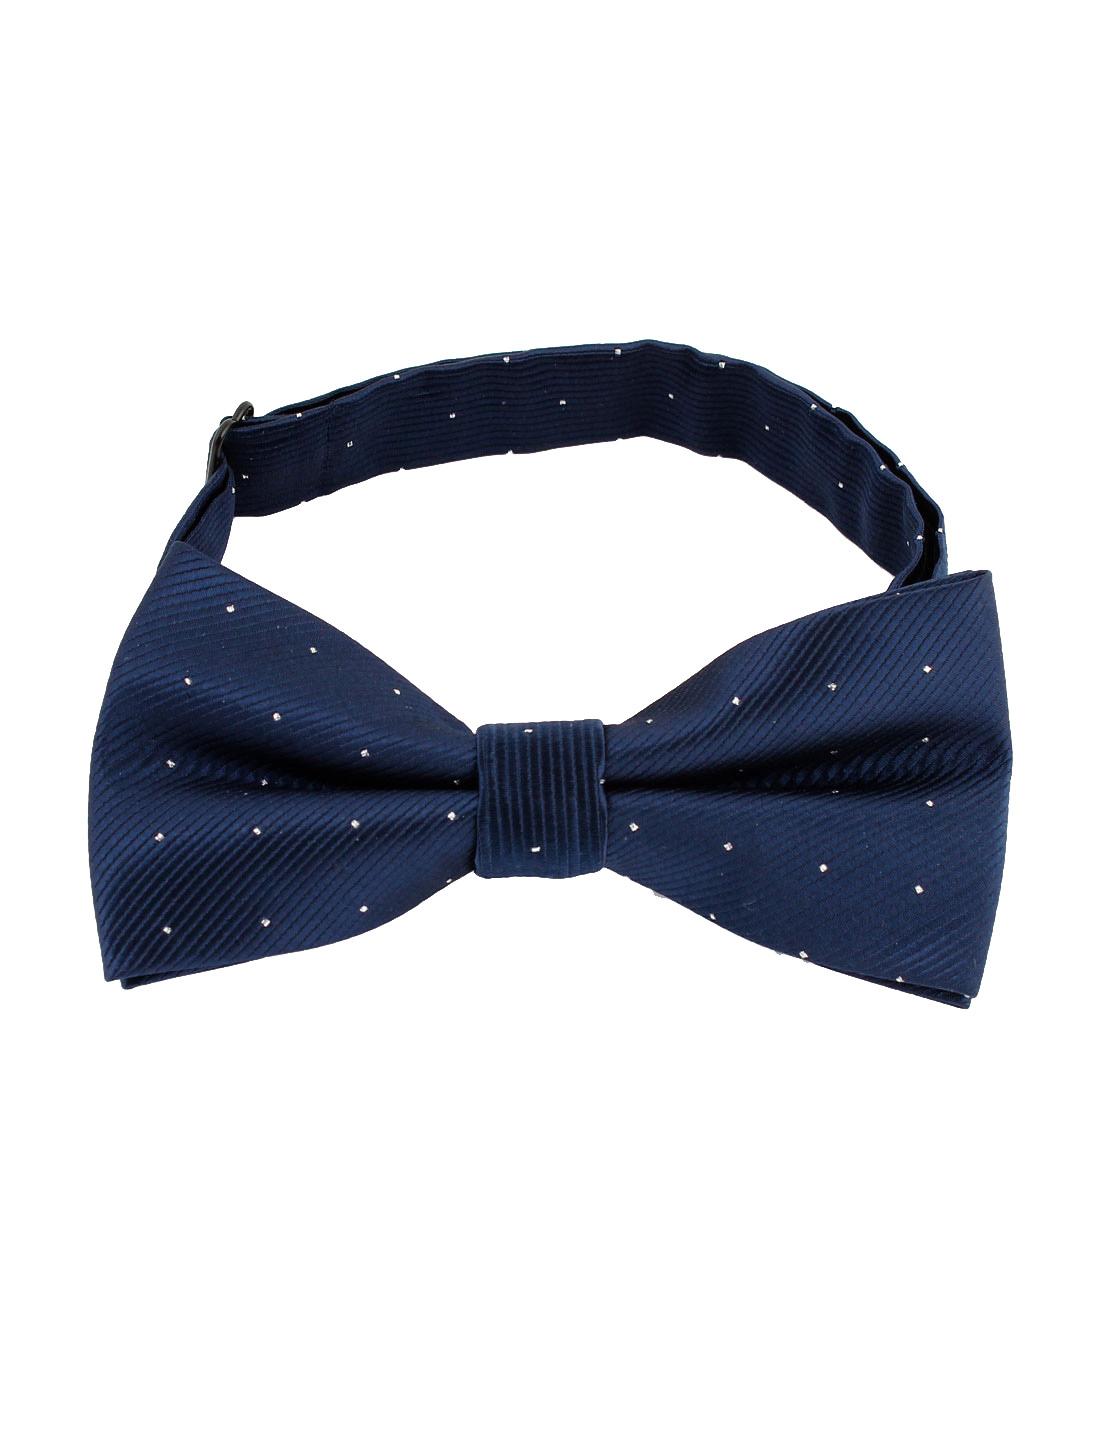 Men Boys Glitter Dots Pattern Adjustable Strap Bow Tie Dark Blue